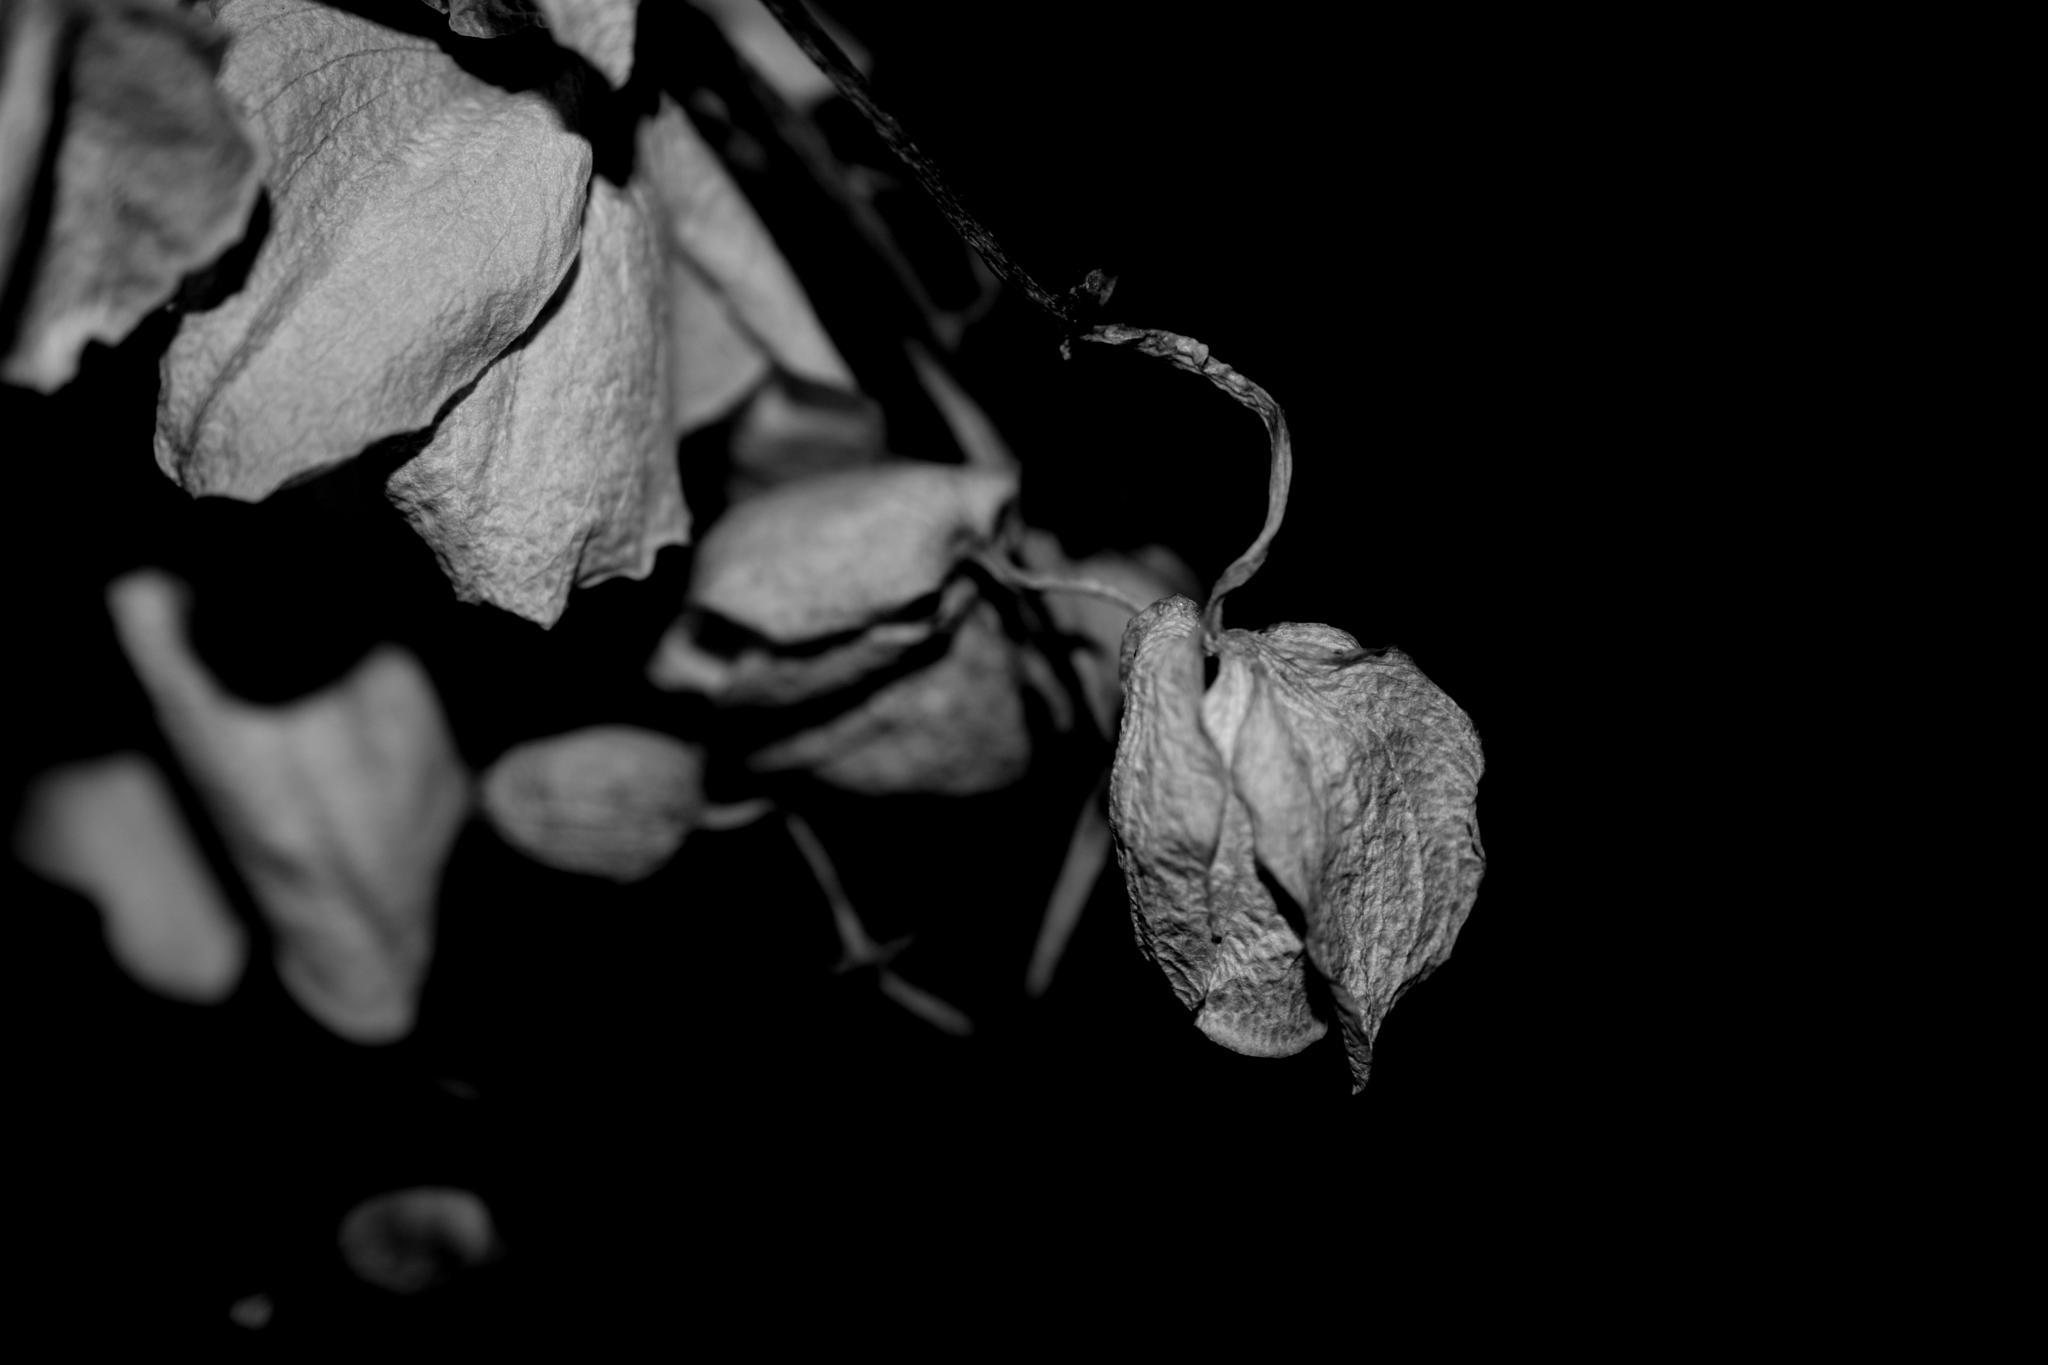 dead orchid by pgavin5000